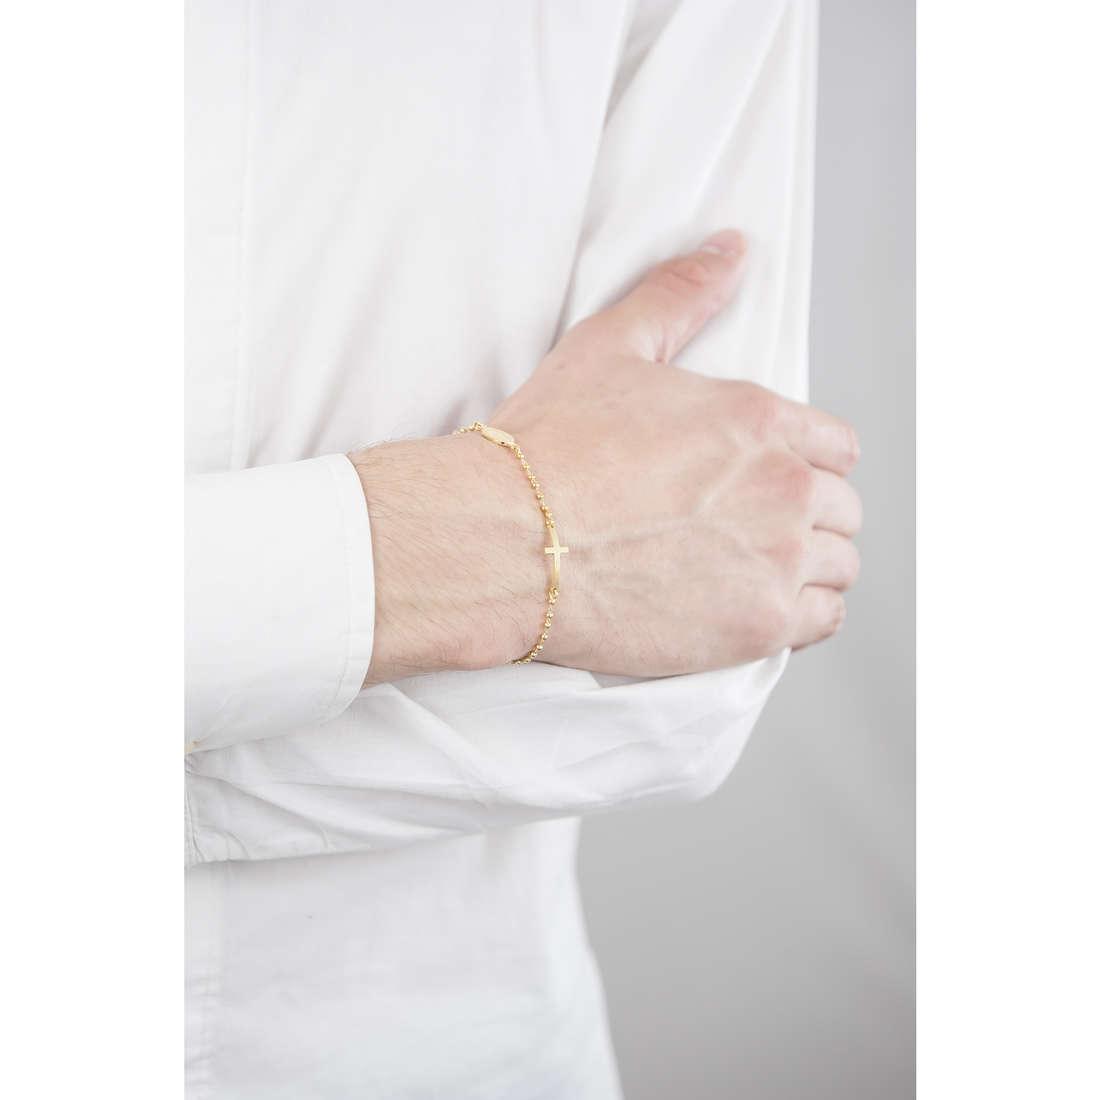 Cesare Paciotti bracelets man JPBR1249G indosso